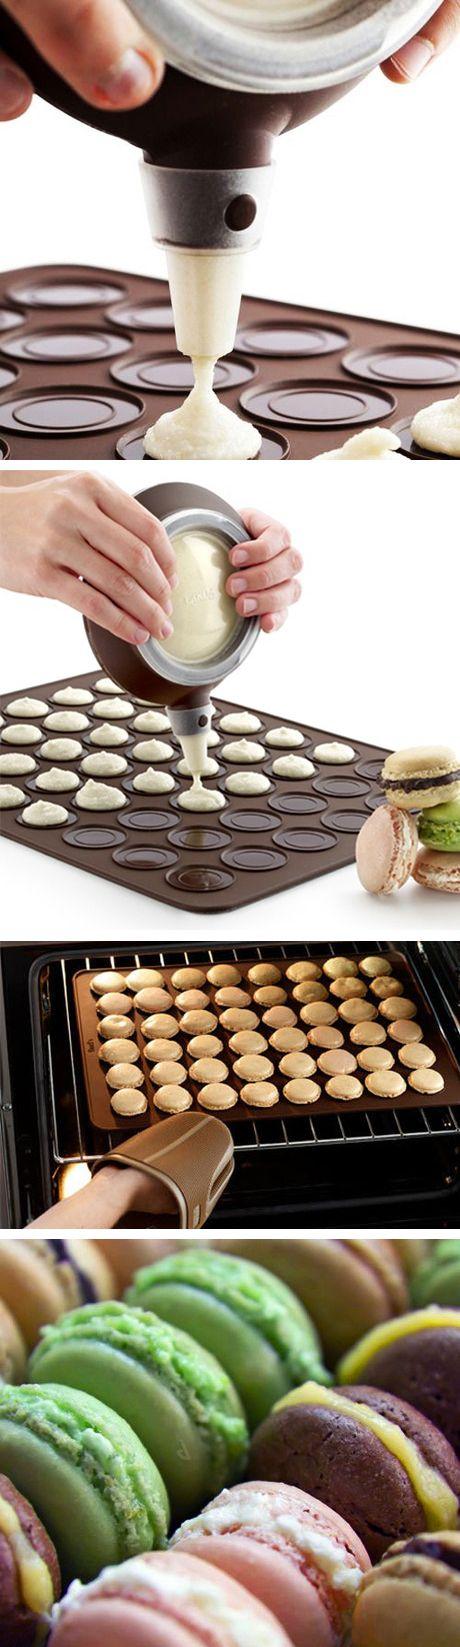 DIY macaron kit - all you need to make perfect macarons at home #product_design